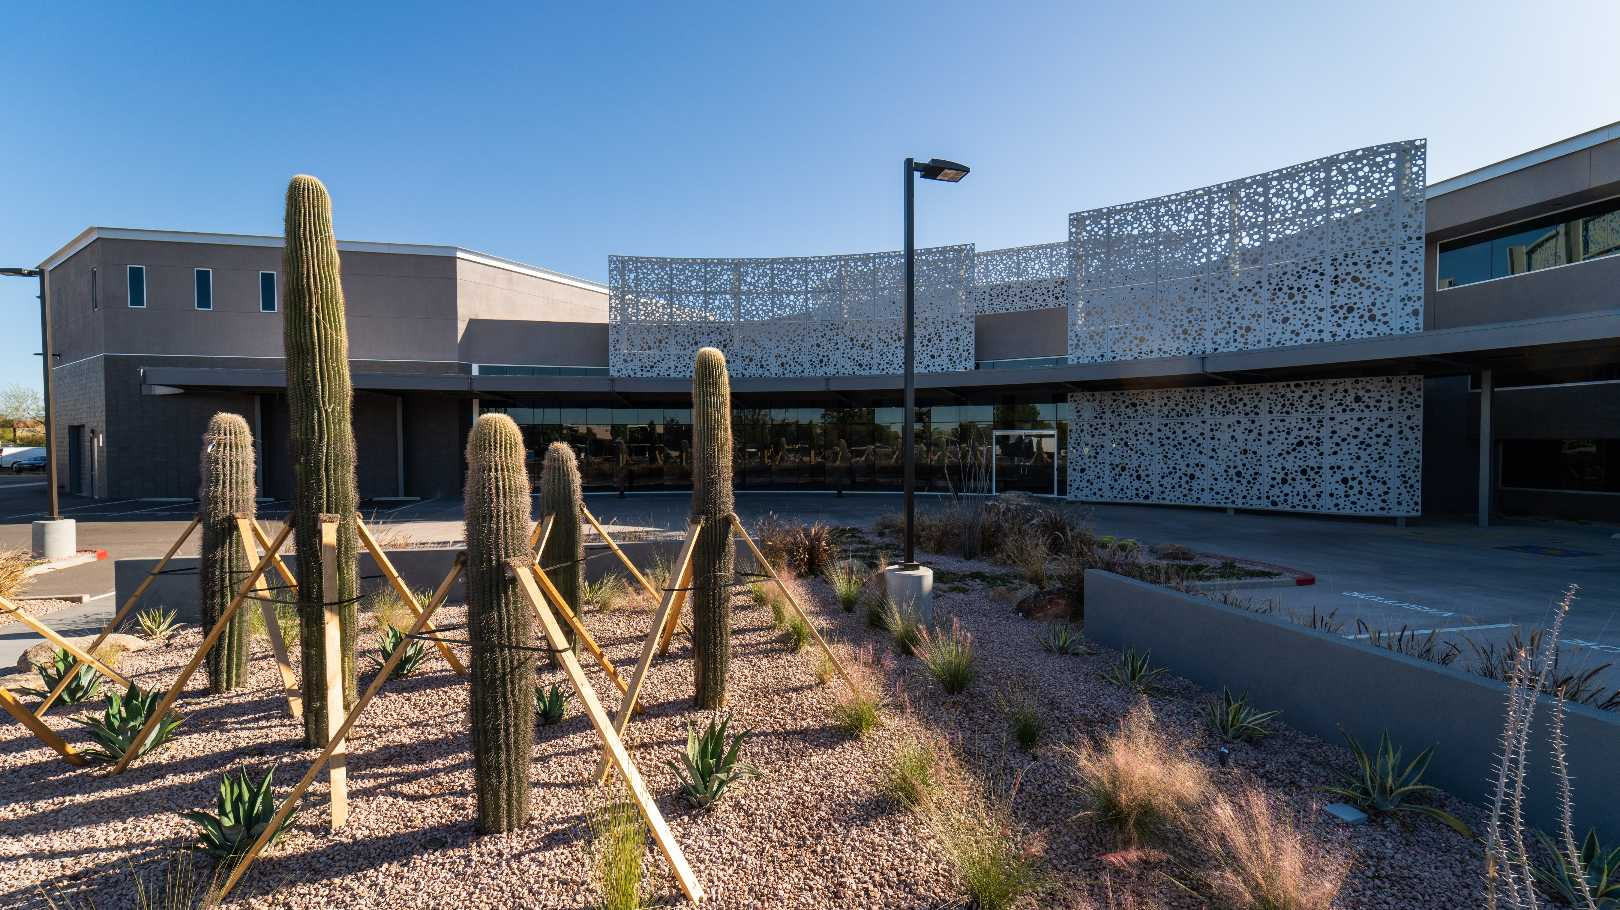 Commercial property landscape arizona